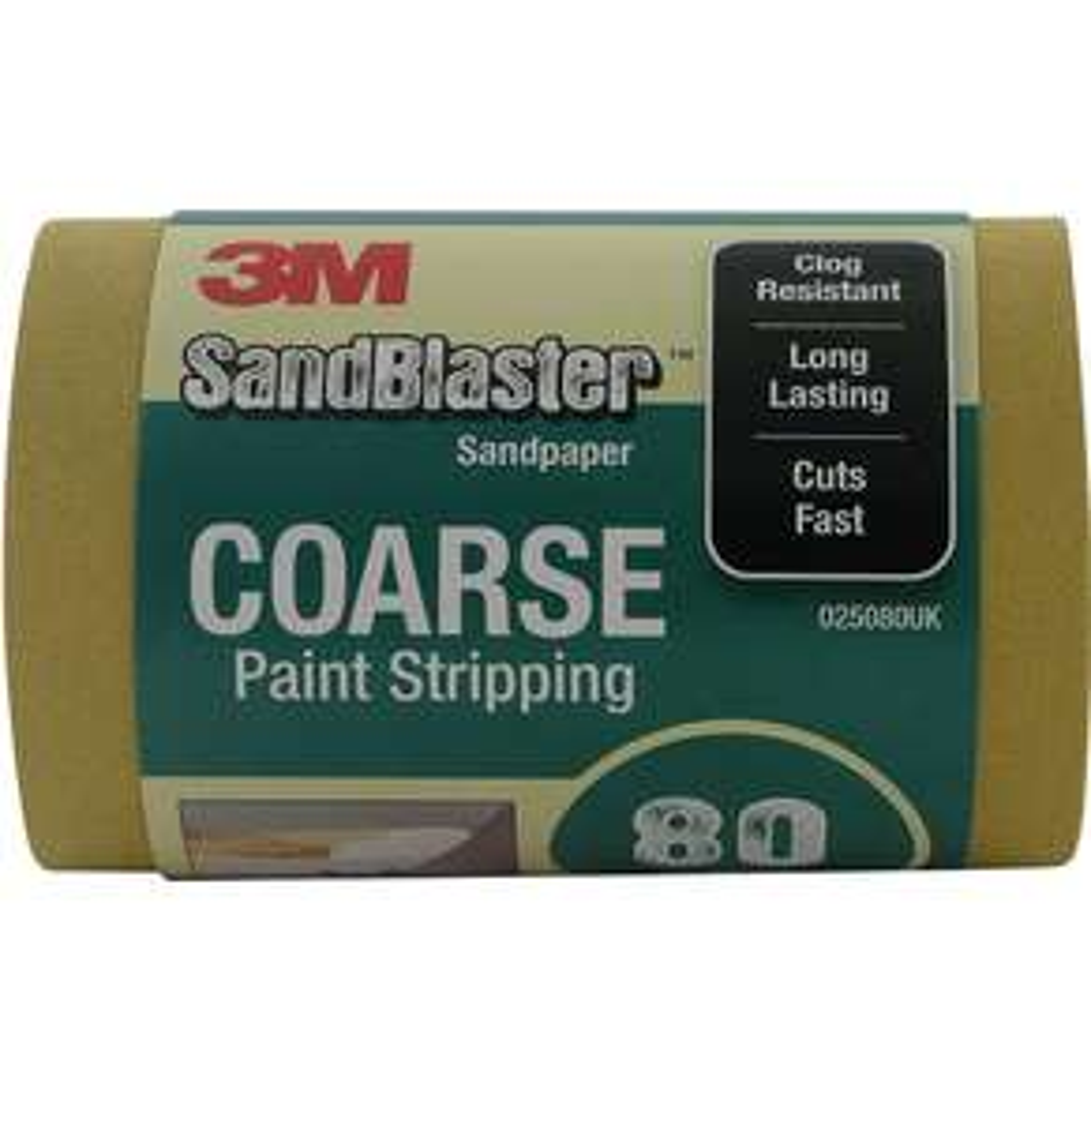 3M Sandpaper (5 metres) Abrasive Roll P80 Coarse Grit 'Paint Stripping' - £4.83 (+£4.49 Non-Prime) @ Amazon